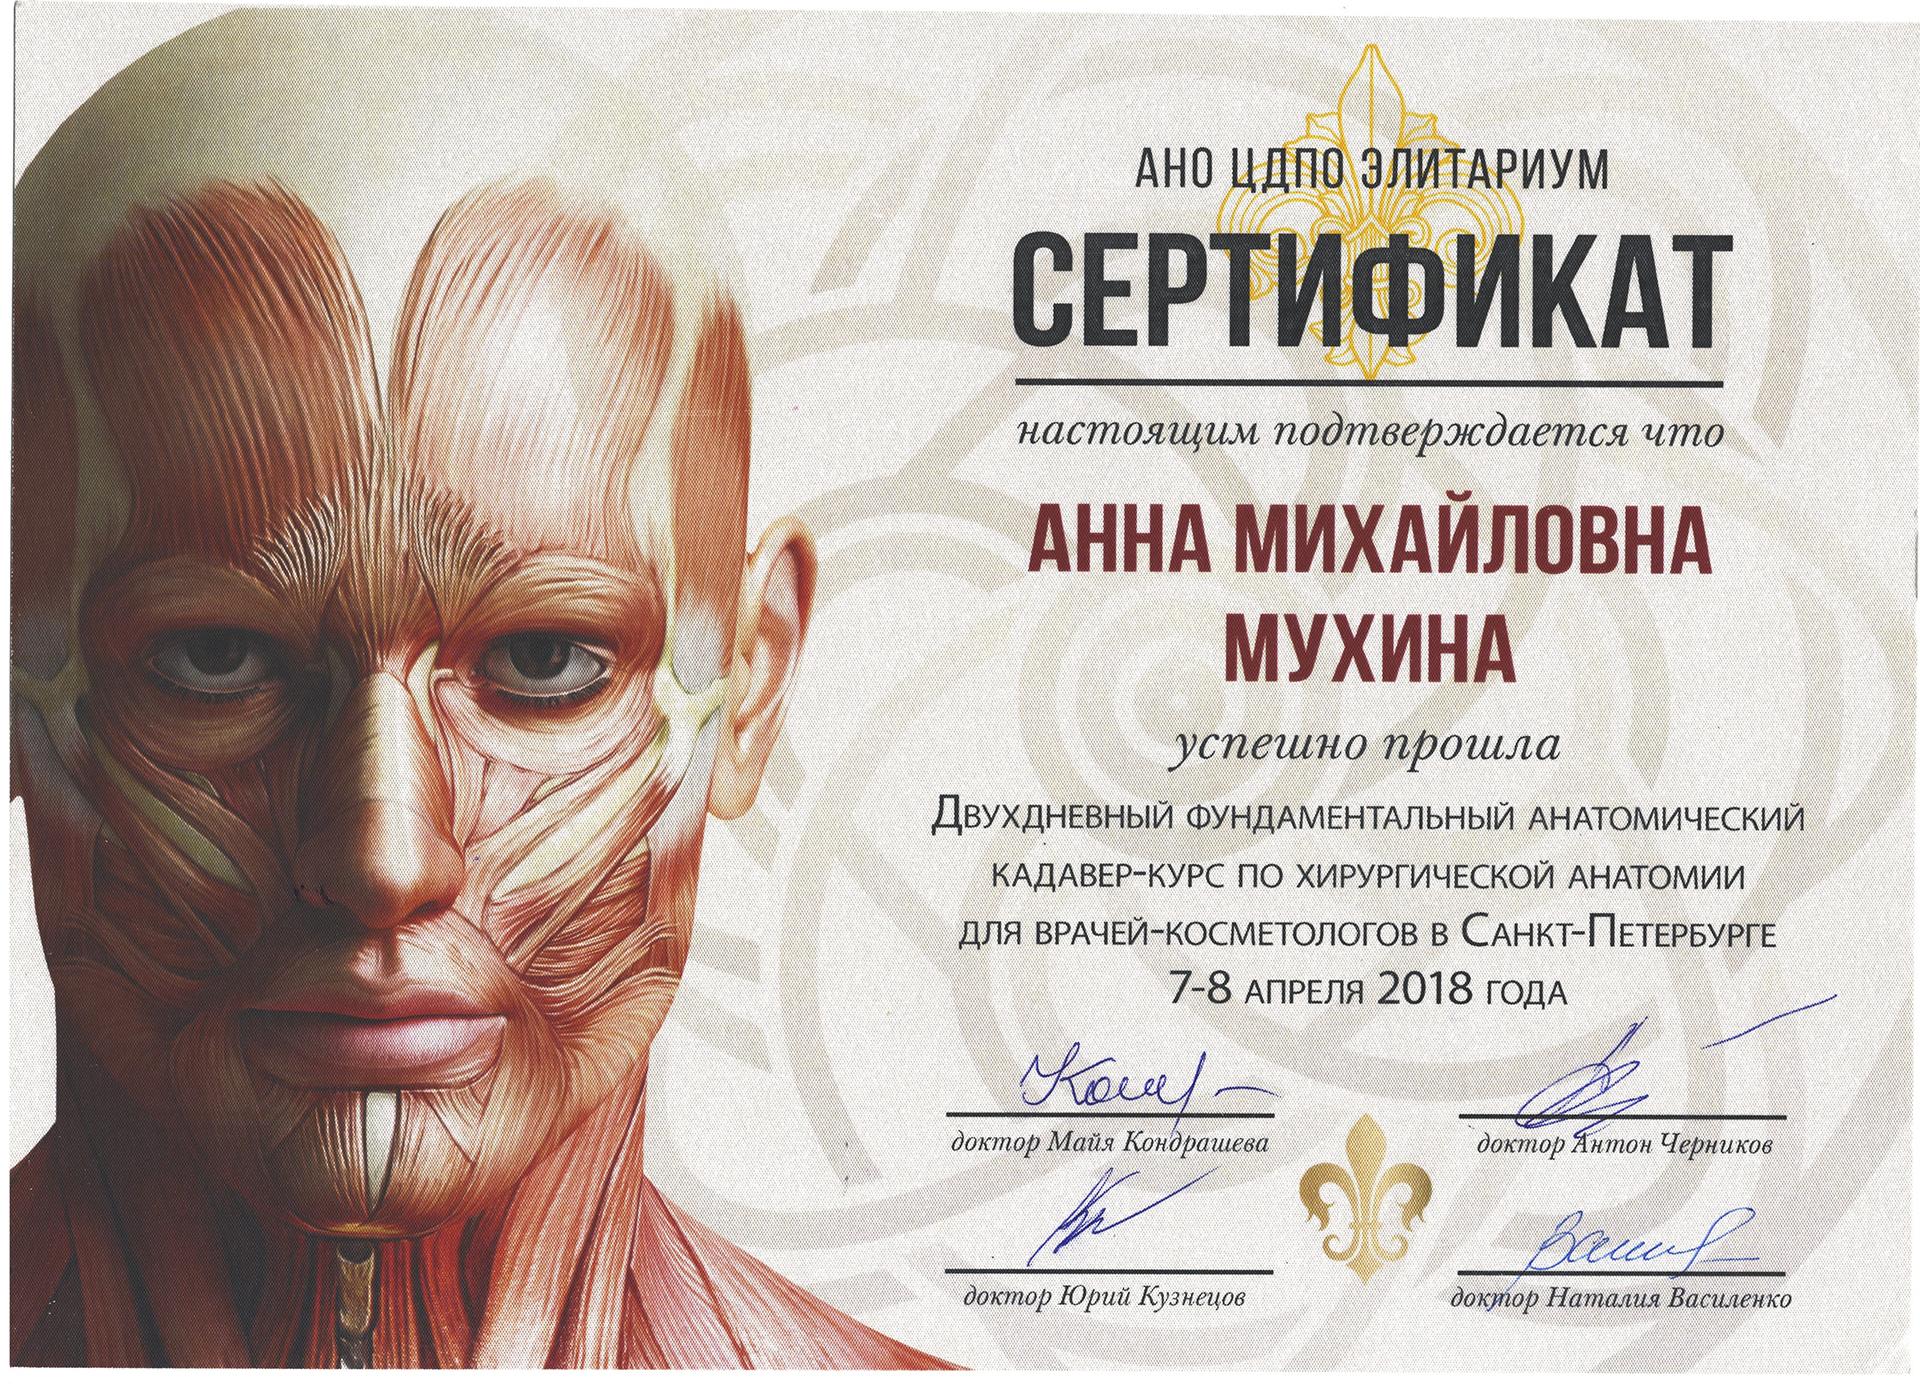 Сертификат — Кадавер-курс по хирургической анатомии. Мухина Анна Михайловна